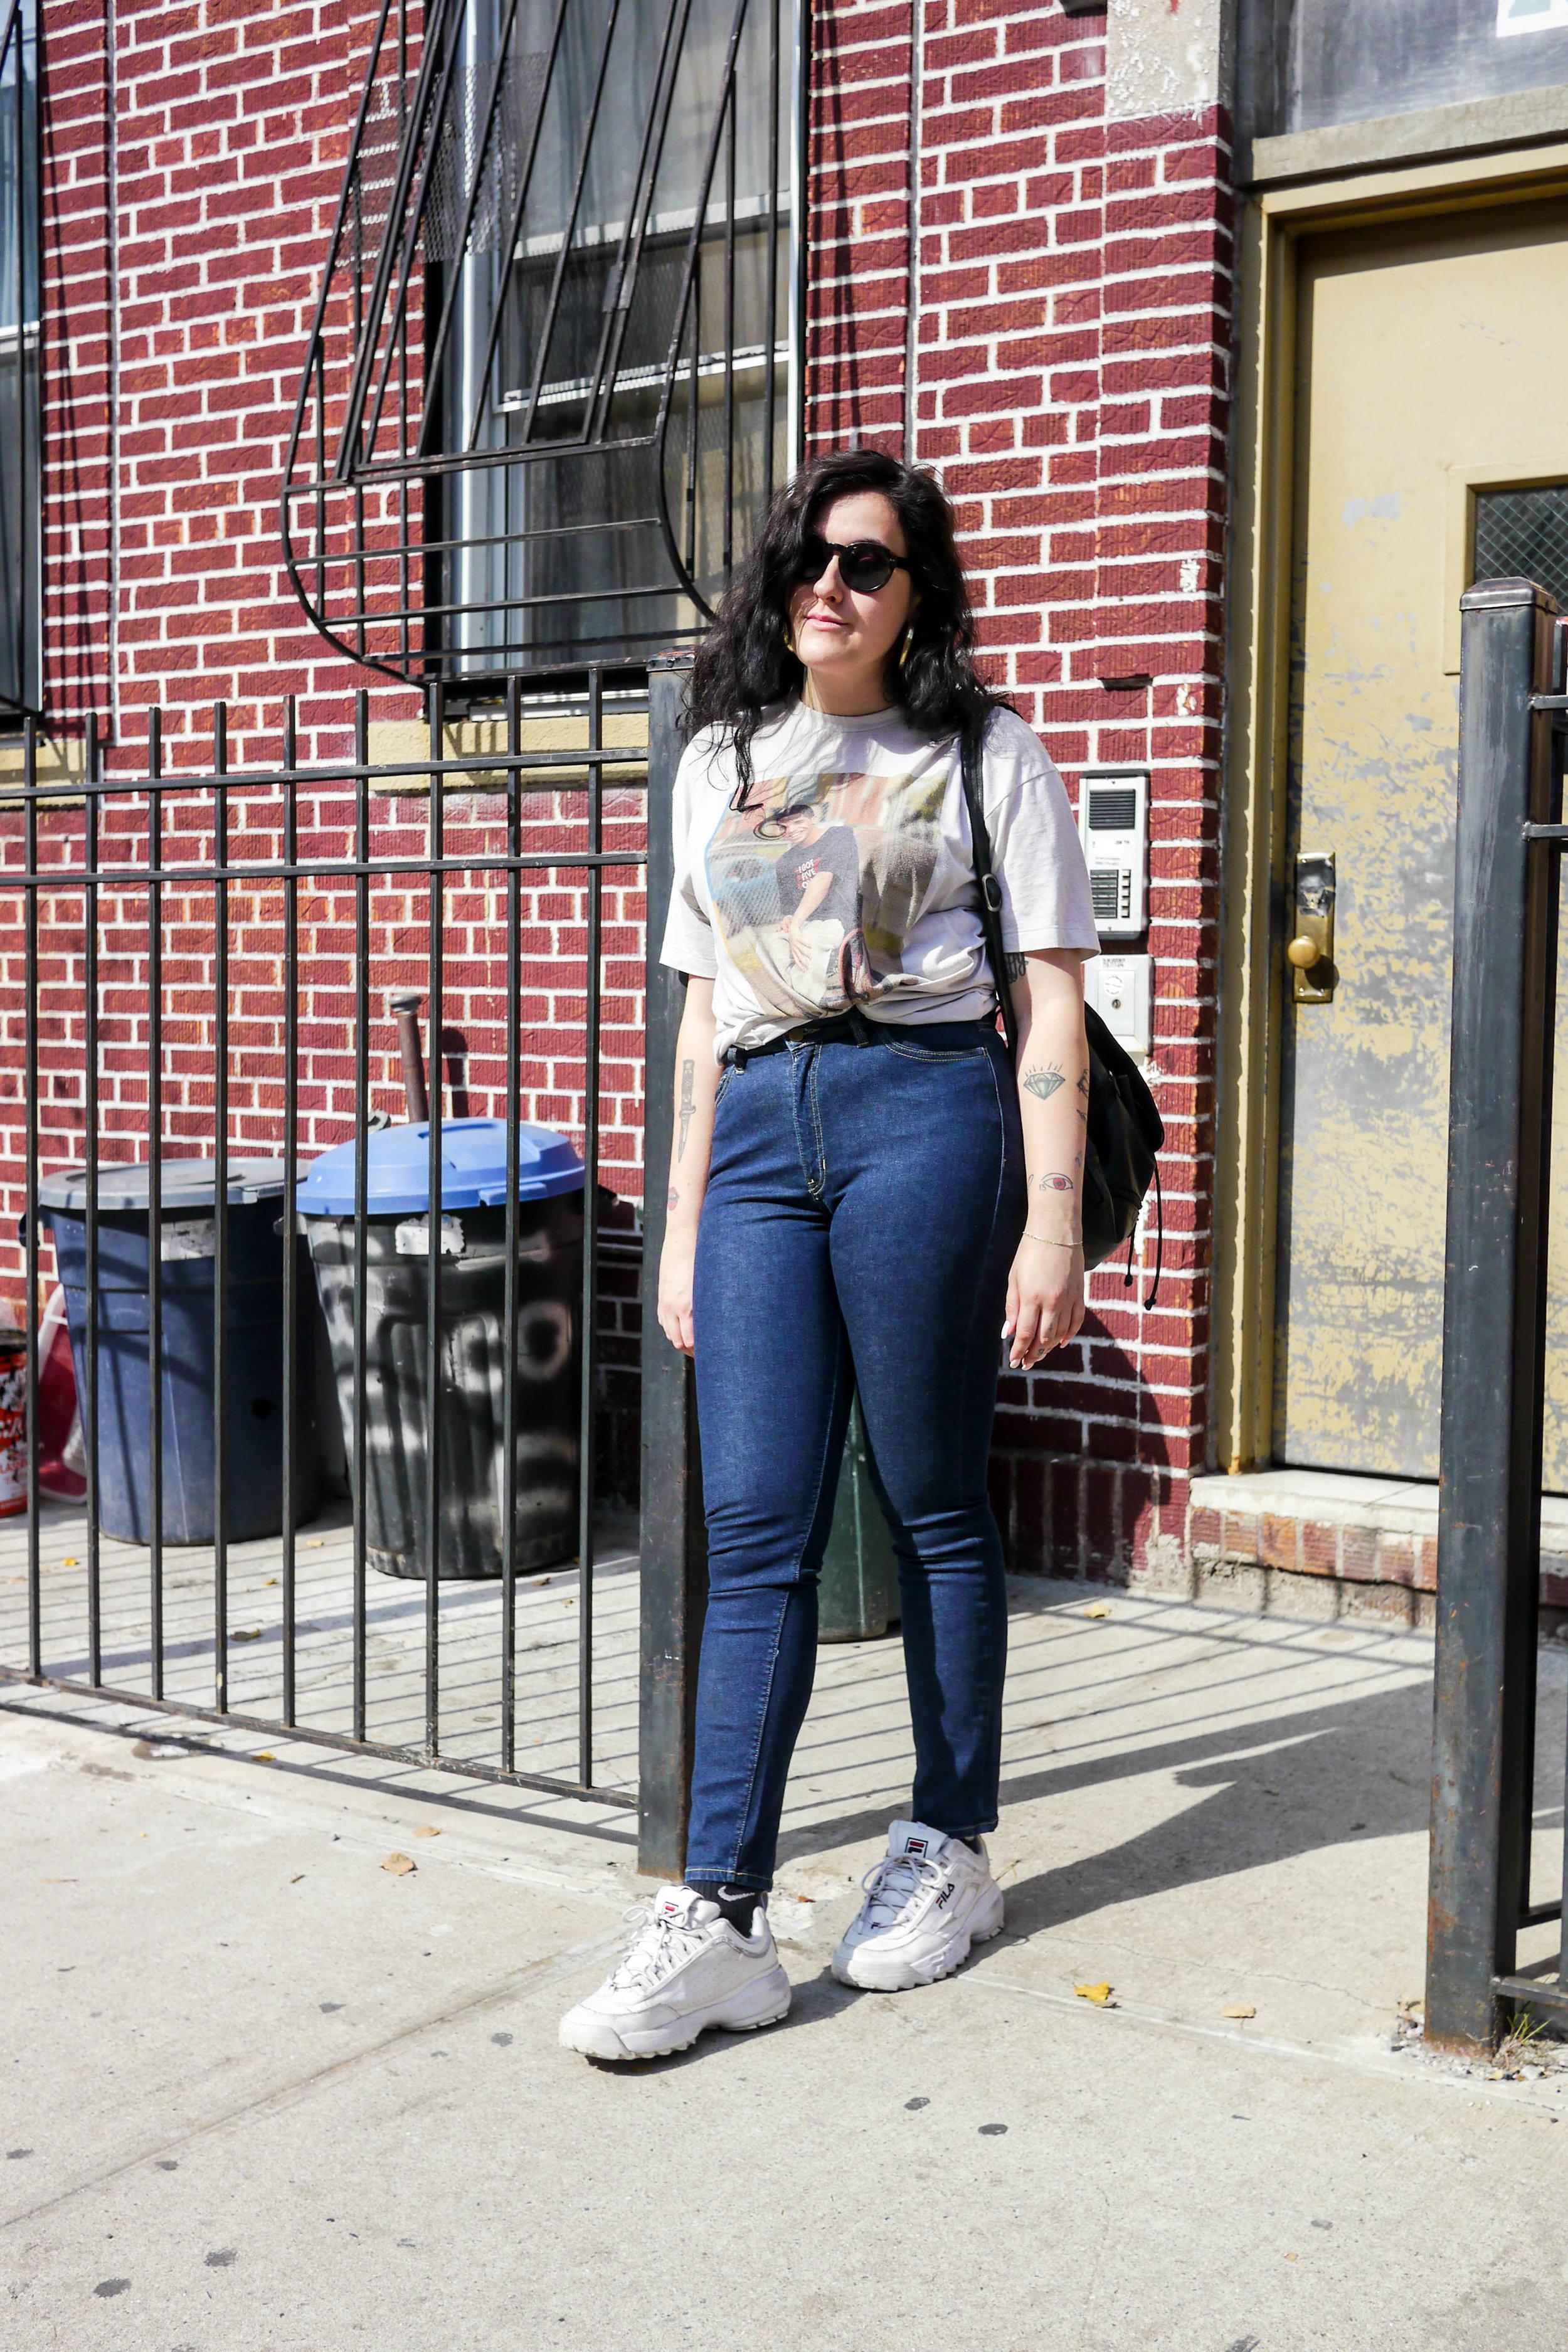 Top, Vintage ;    Jeans, American Apparel    ; Bag, Vintage ;    Shoes, FILA    ;    Sunglasses, Madewell